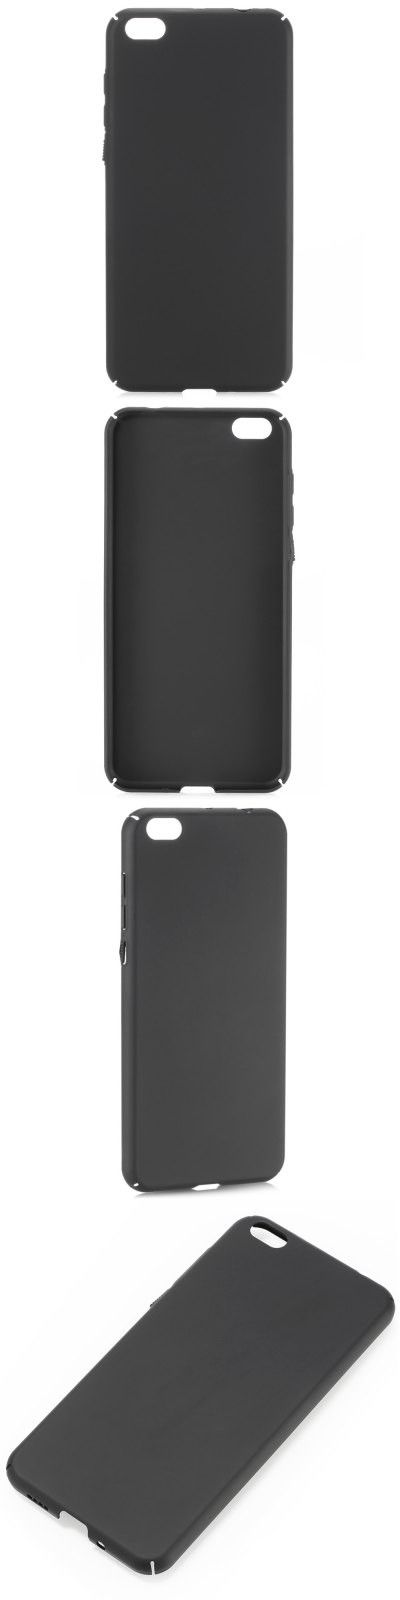 Luanke PC Case for Xiaomi Mi 5C-3.56